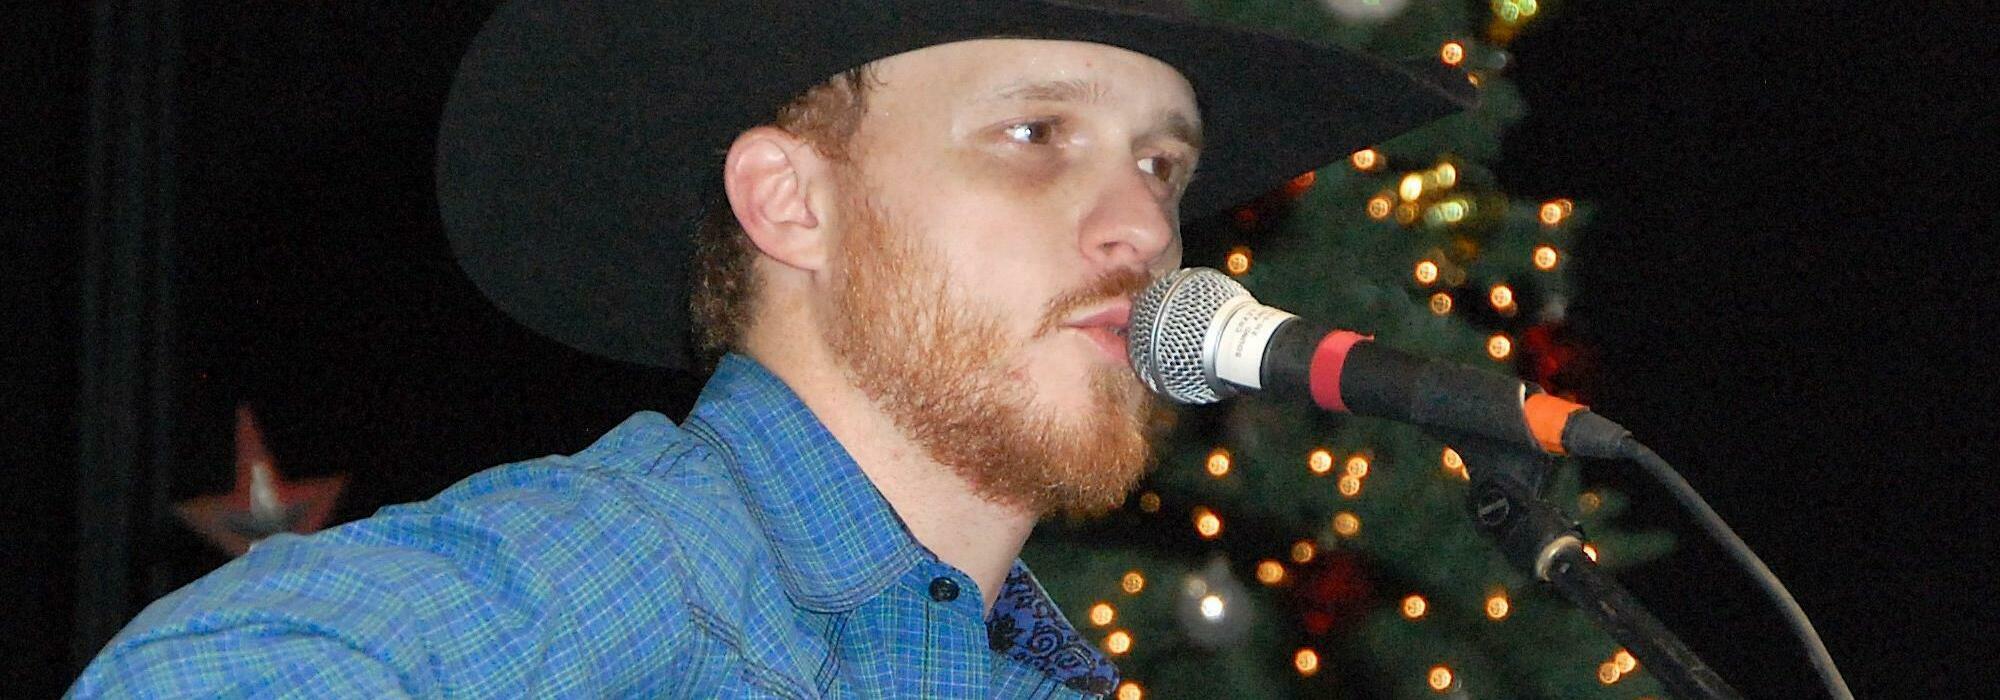 A Cody Johnson live event